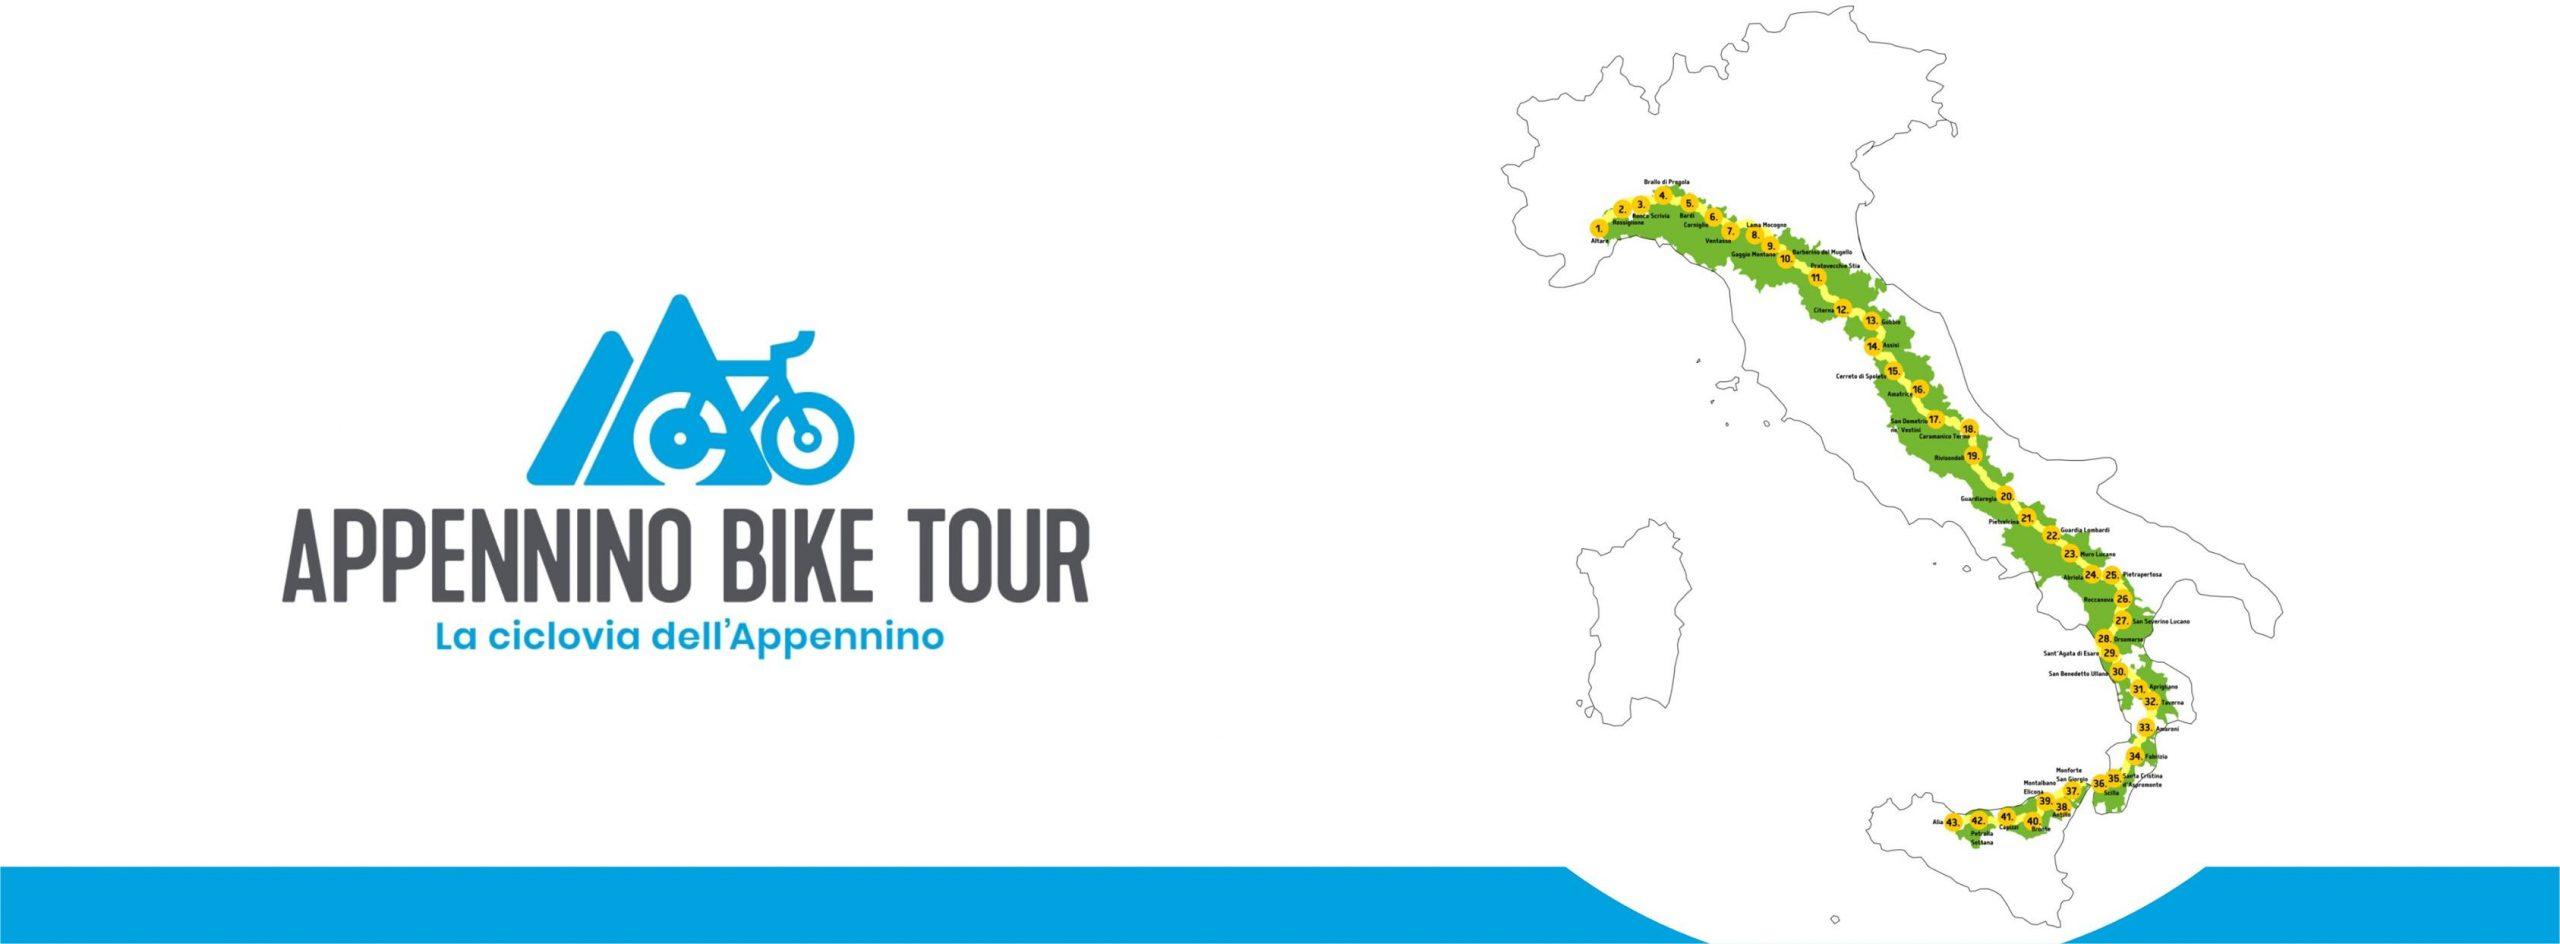 Presentato Appennino Bike Tour 2021, la ciclovia più lunga d'Italia